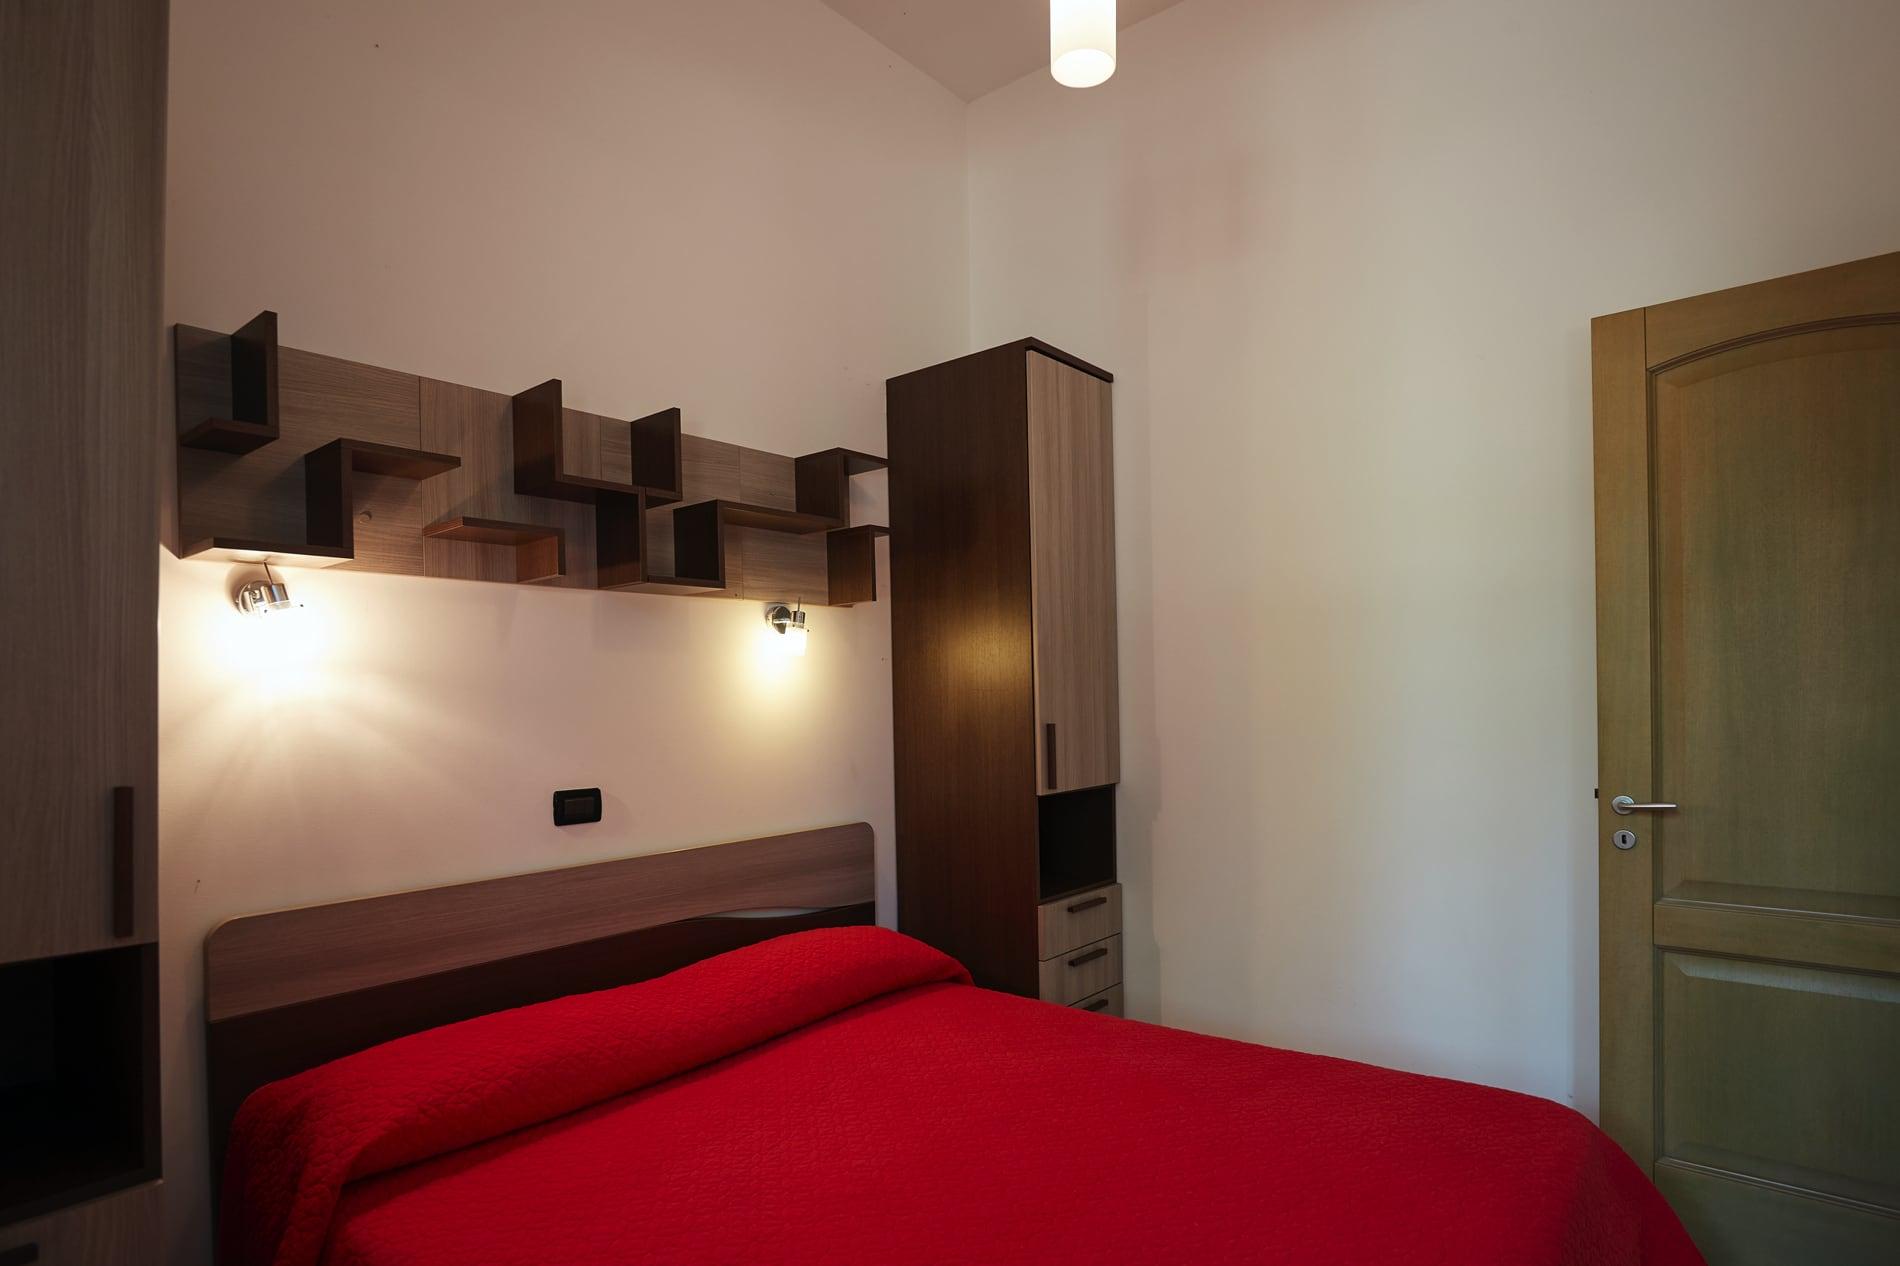 appartamenti large8I3444